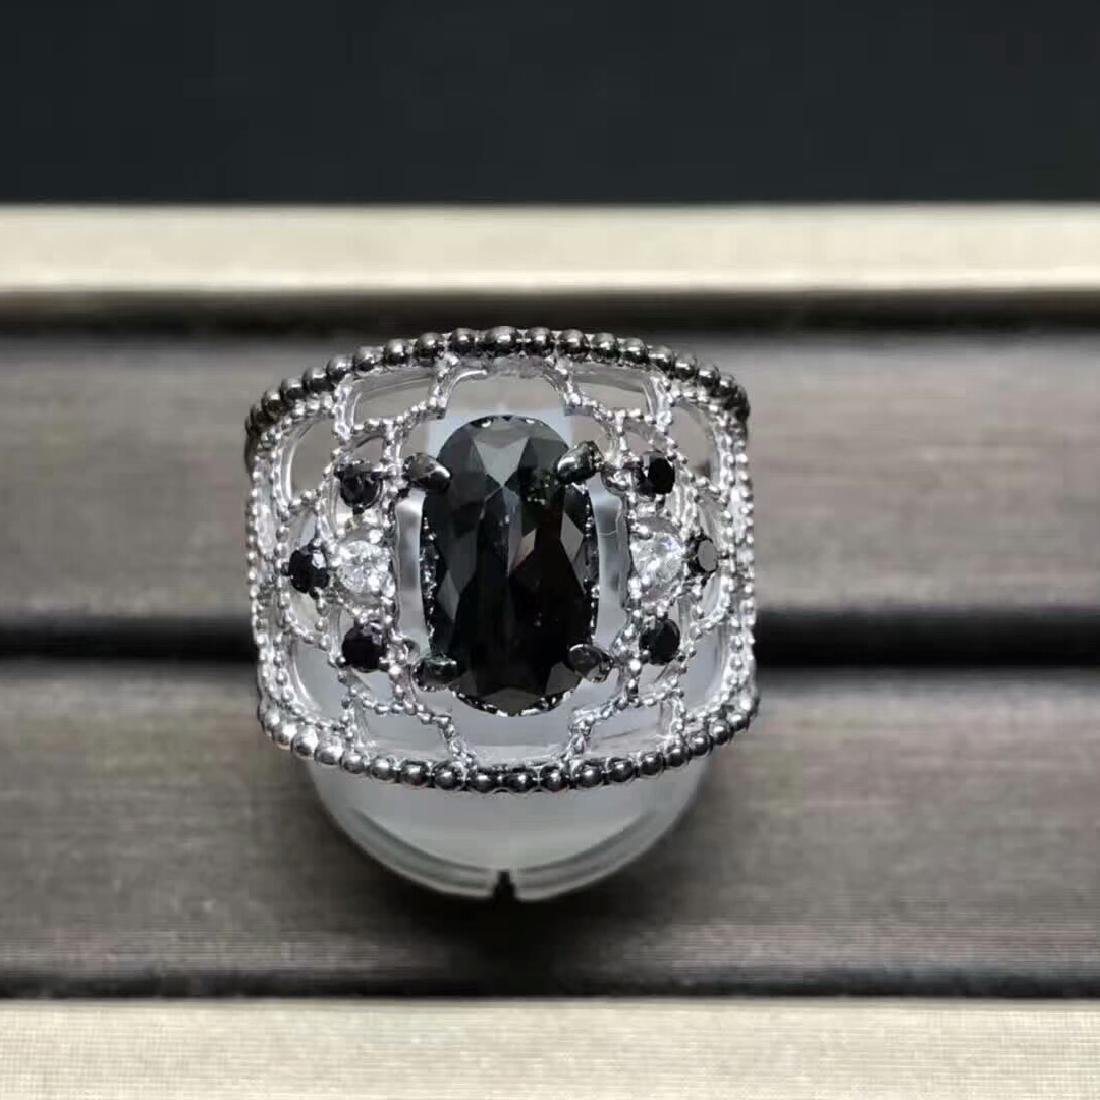 3.16ct Black Diamond Ring in 18kt White Gold